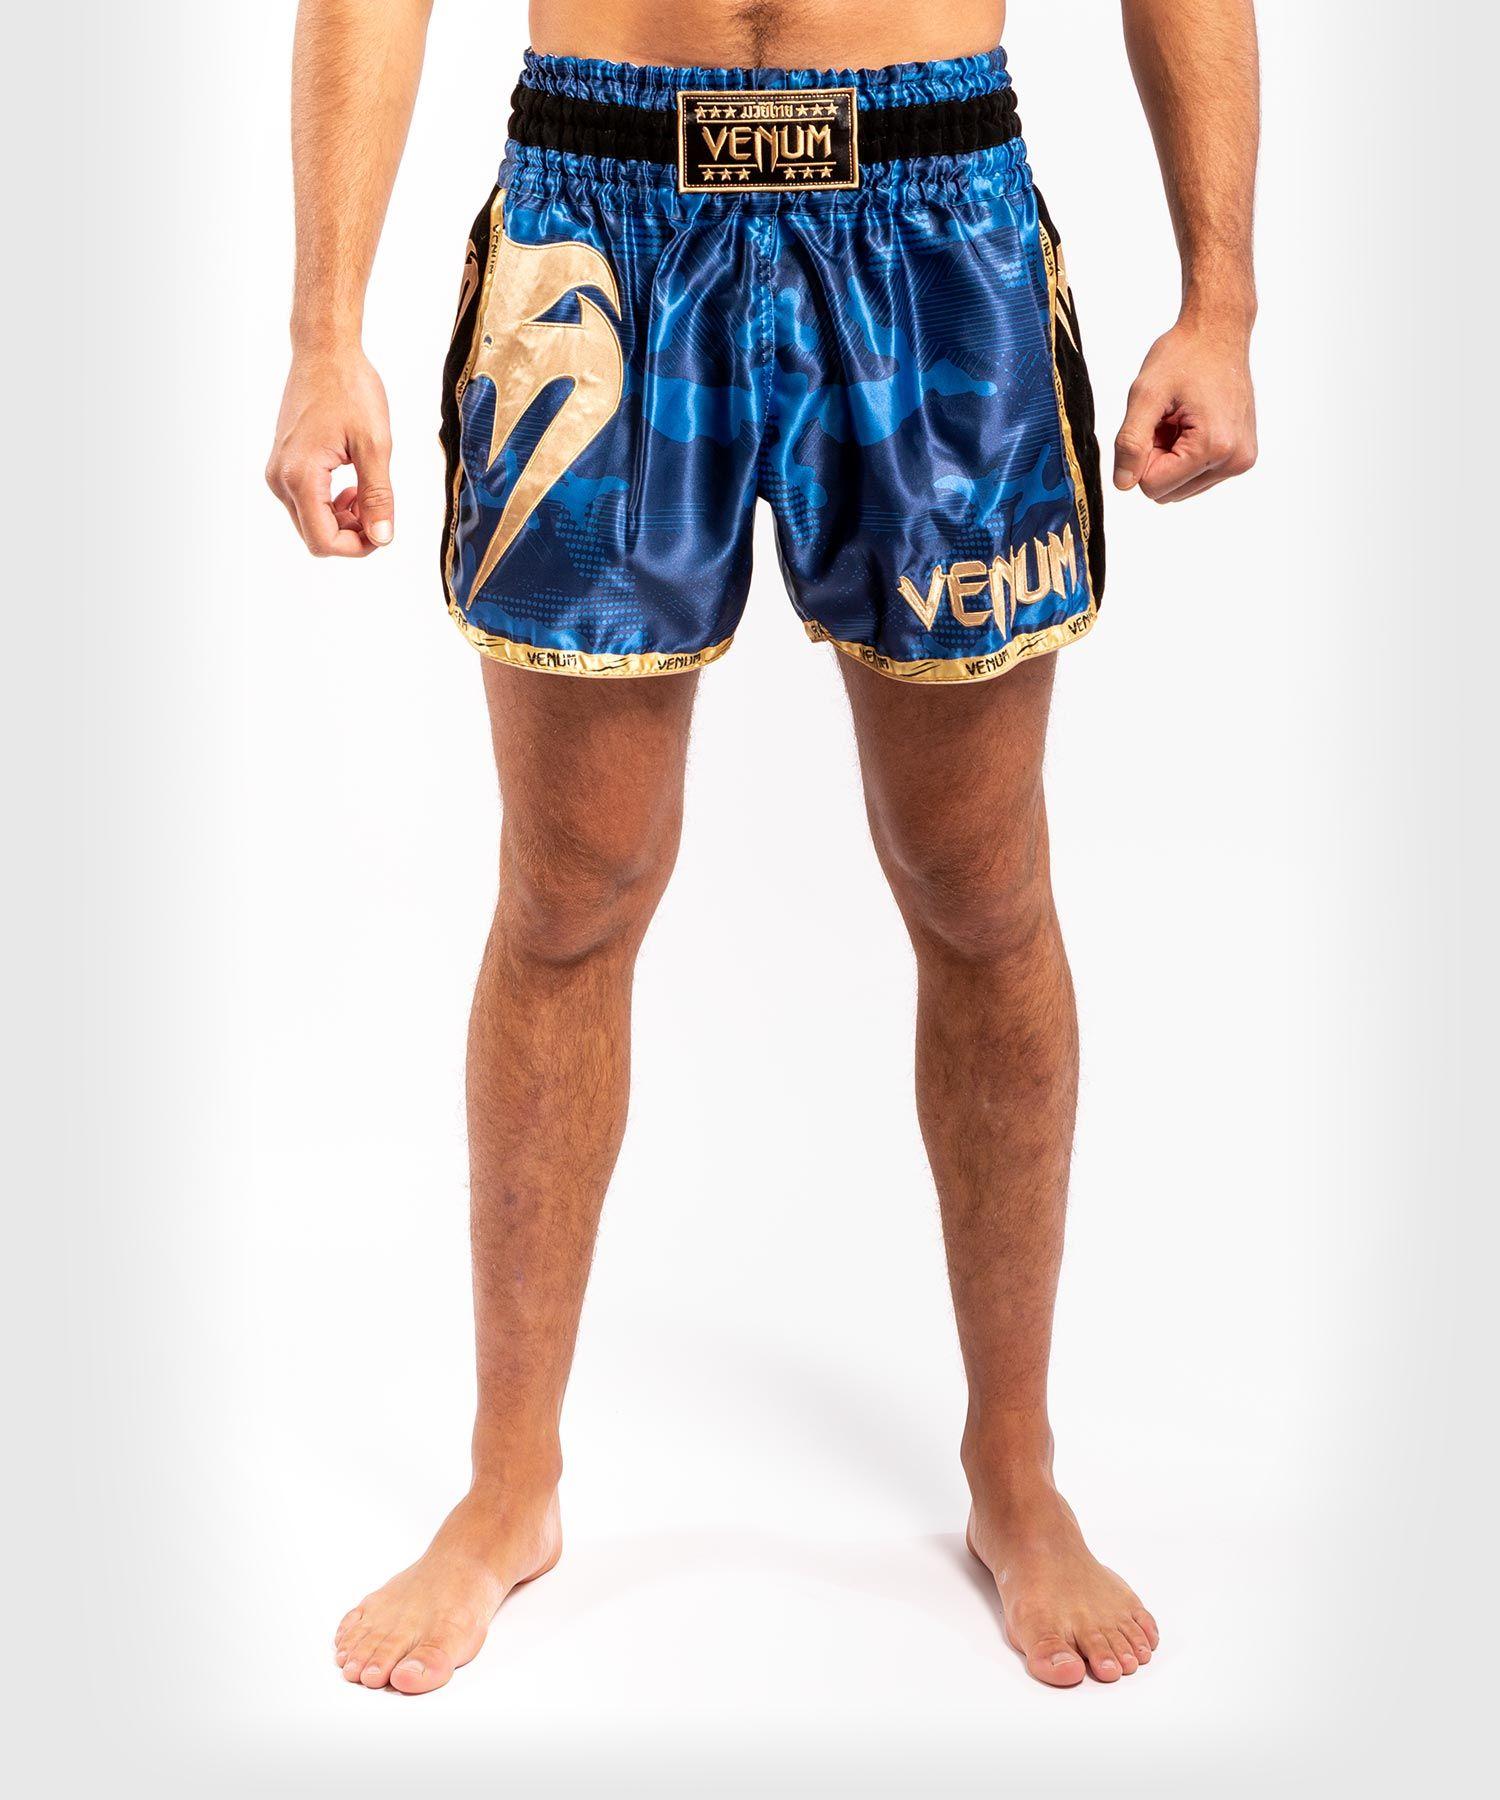 Venum Giant Camo Muay Thai Shorts - Blue/Gold